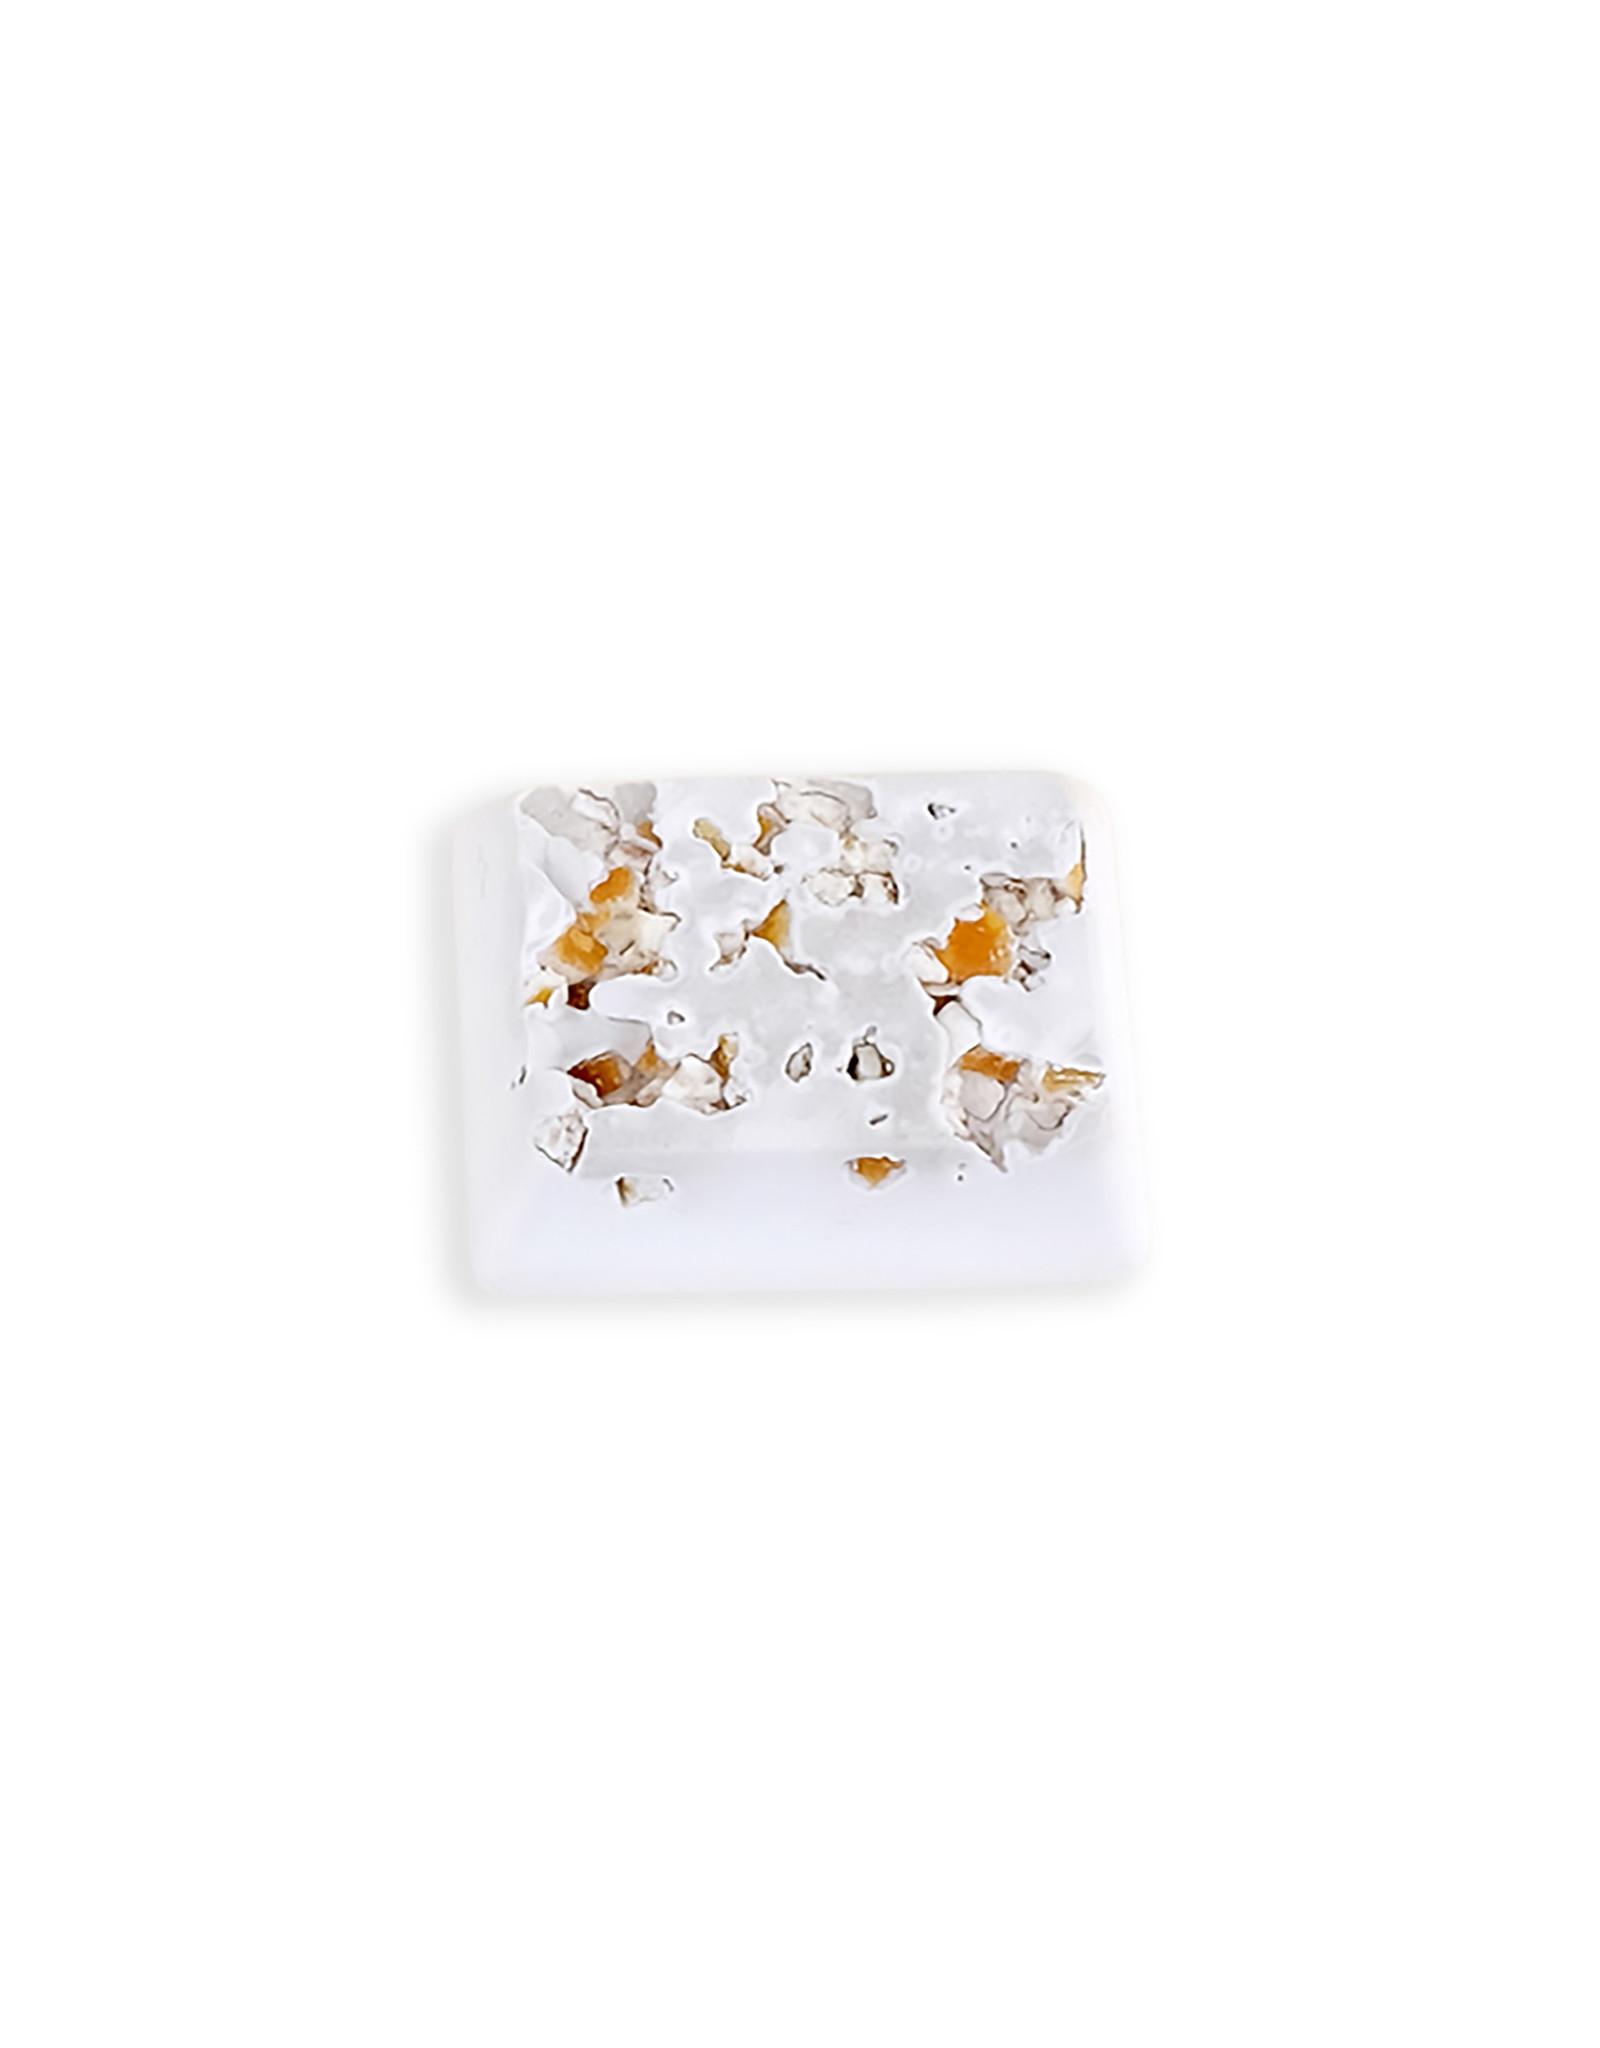 Living World Living World Small Animal Mineral Block, Orange Flavour, Small, 40 g (1.4 oz)